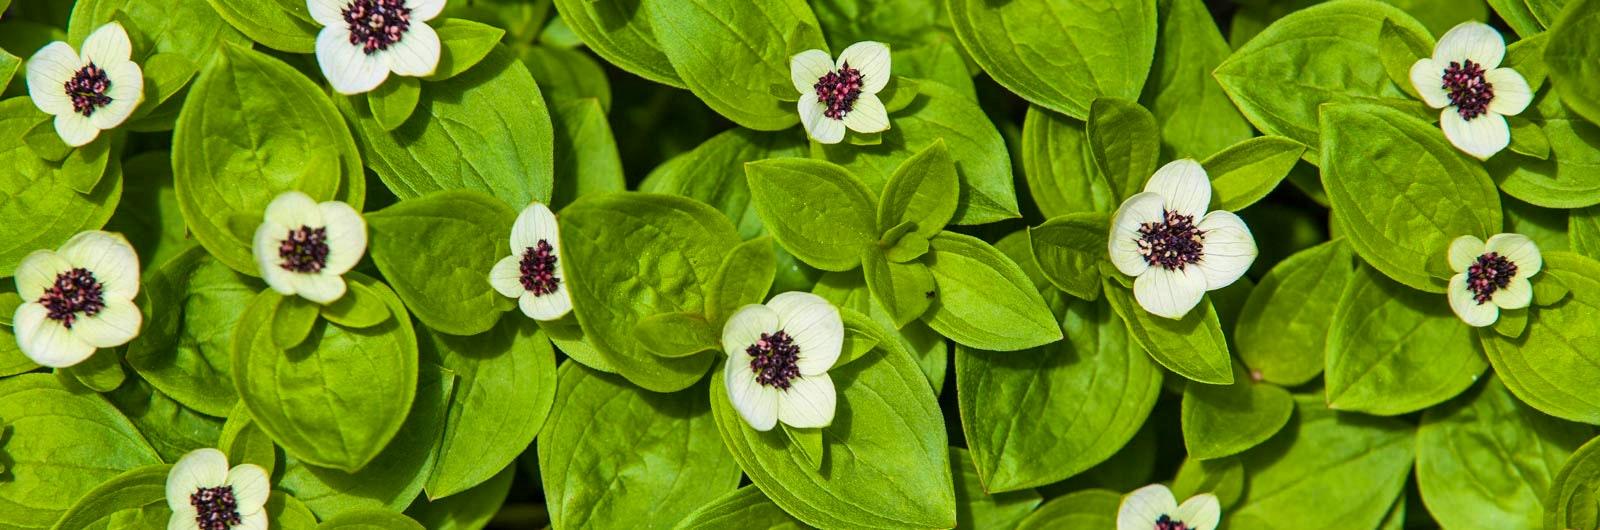 Vita blommor bland gröna blad i närbild